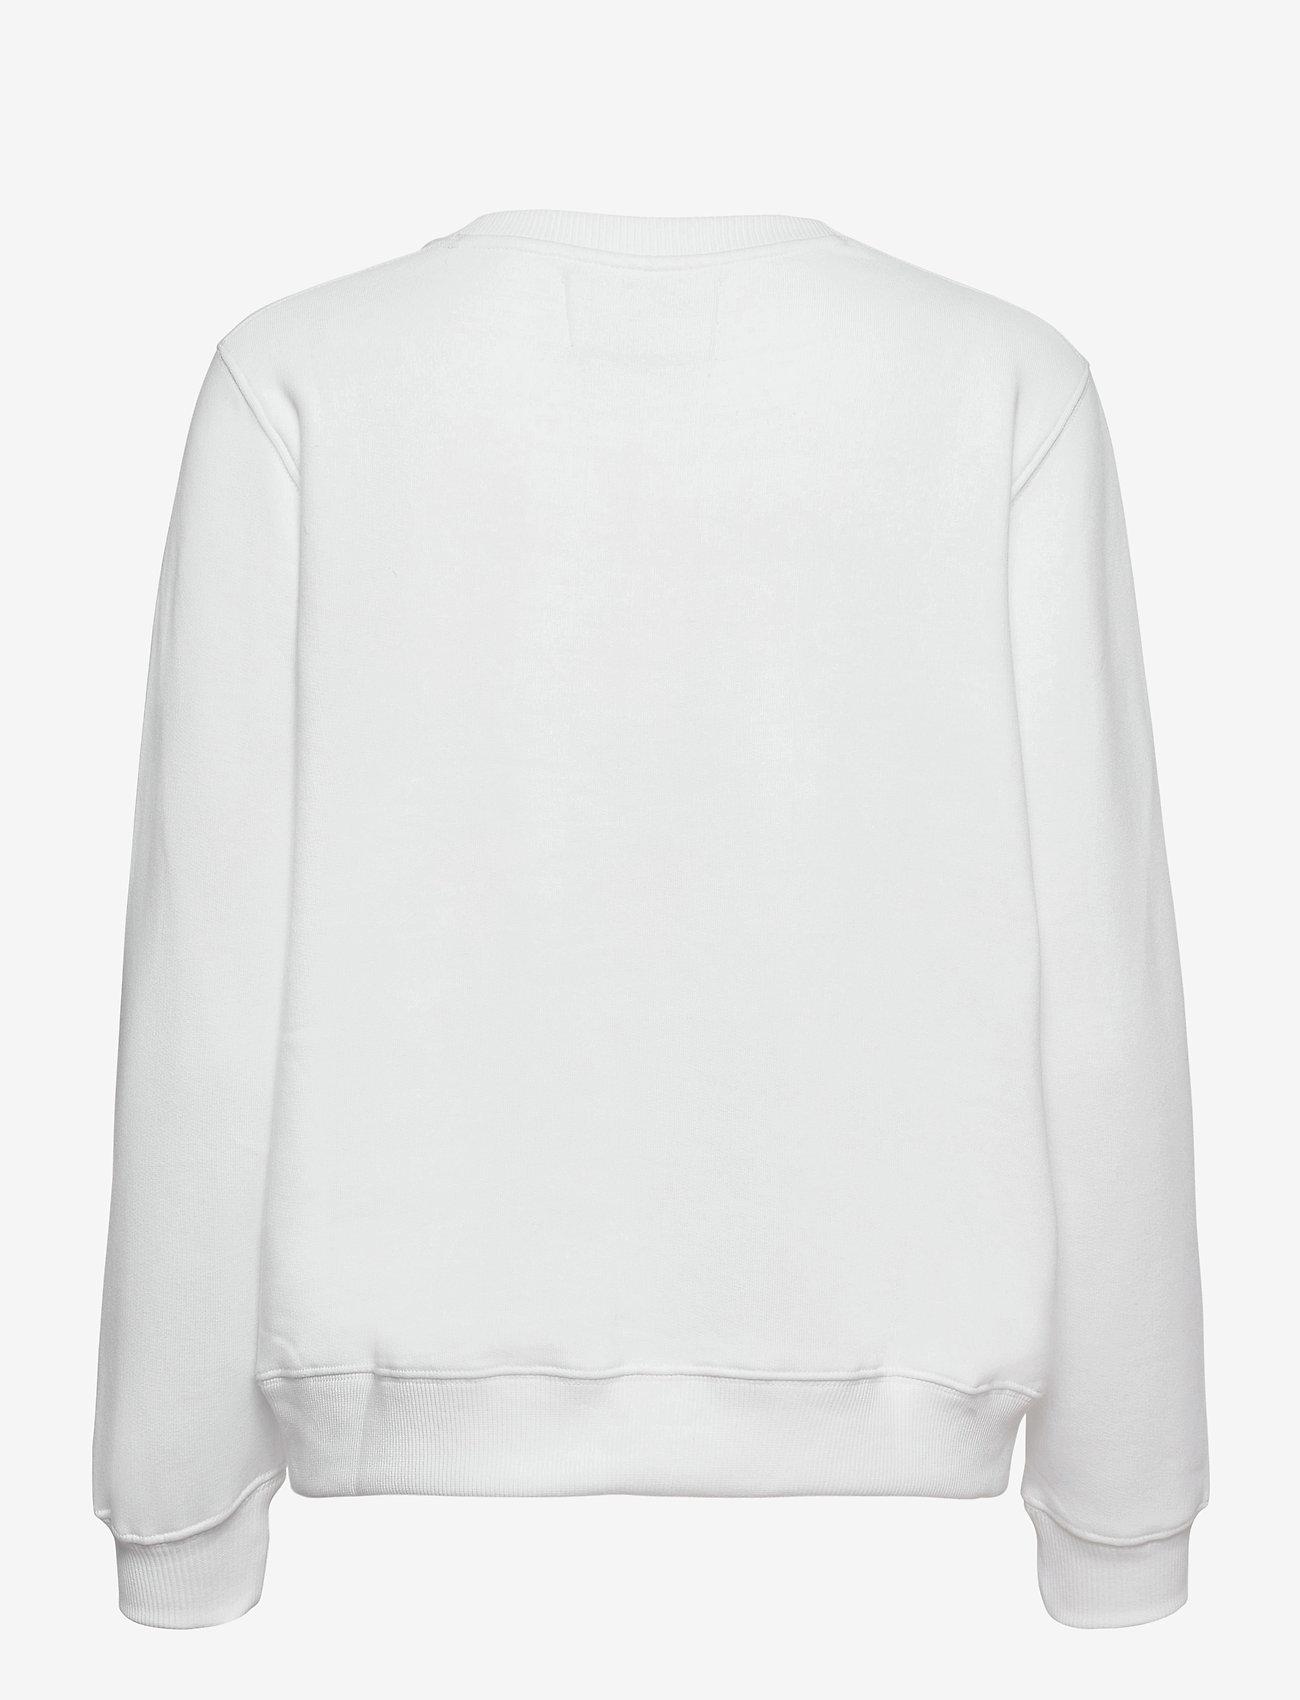 Calvin Klein Jeans - MONOGRAM LOGO CREW NECK - sweatshirts - bright white - 1